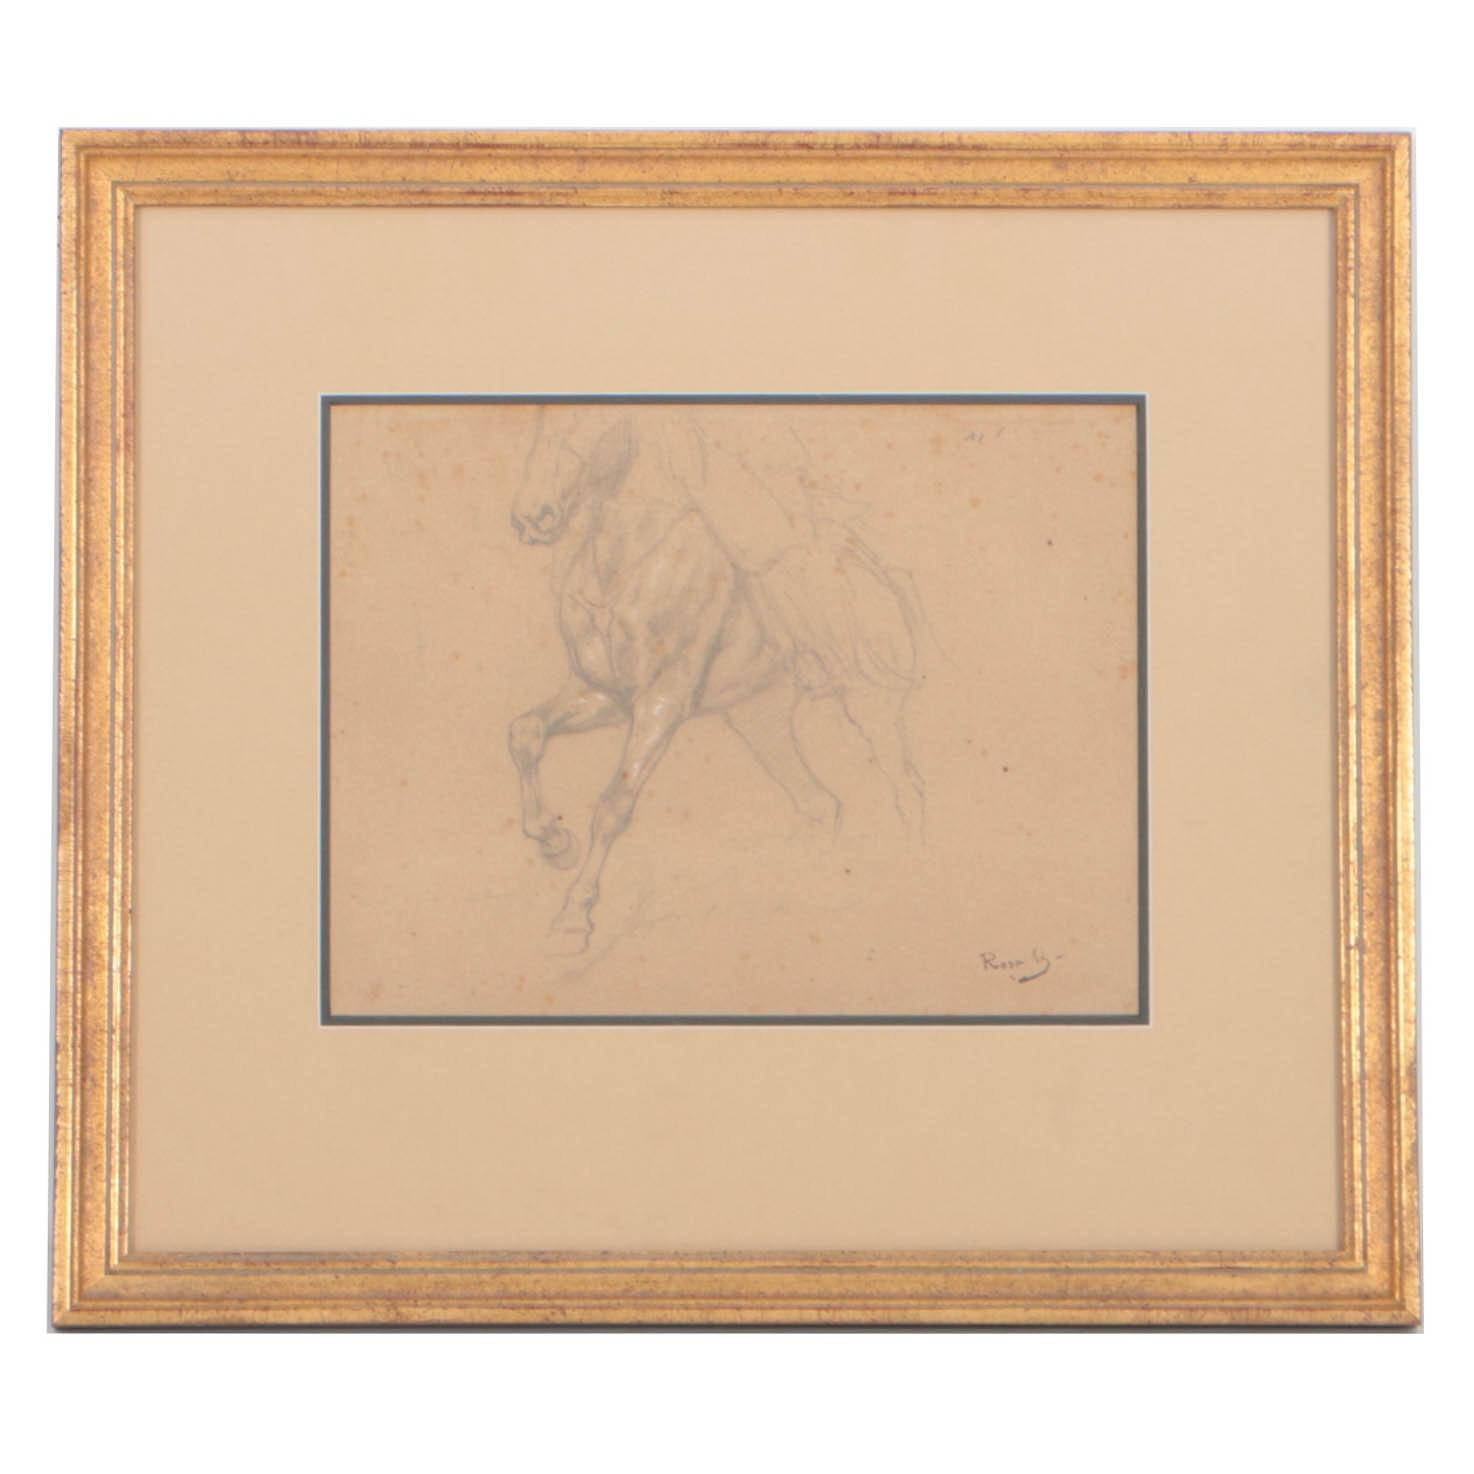 Rosa Bonheur Graphite Drawing Figure on Horseback